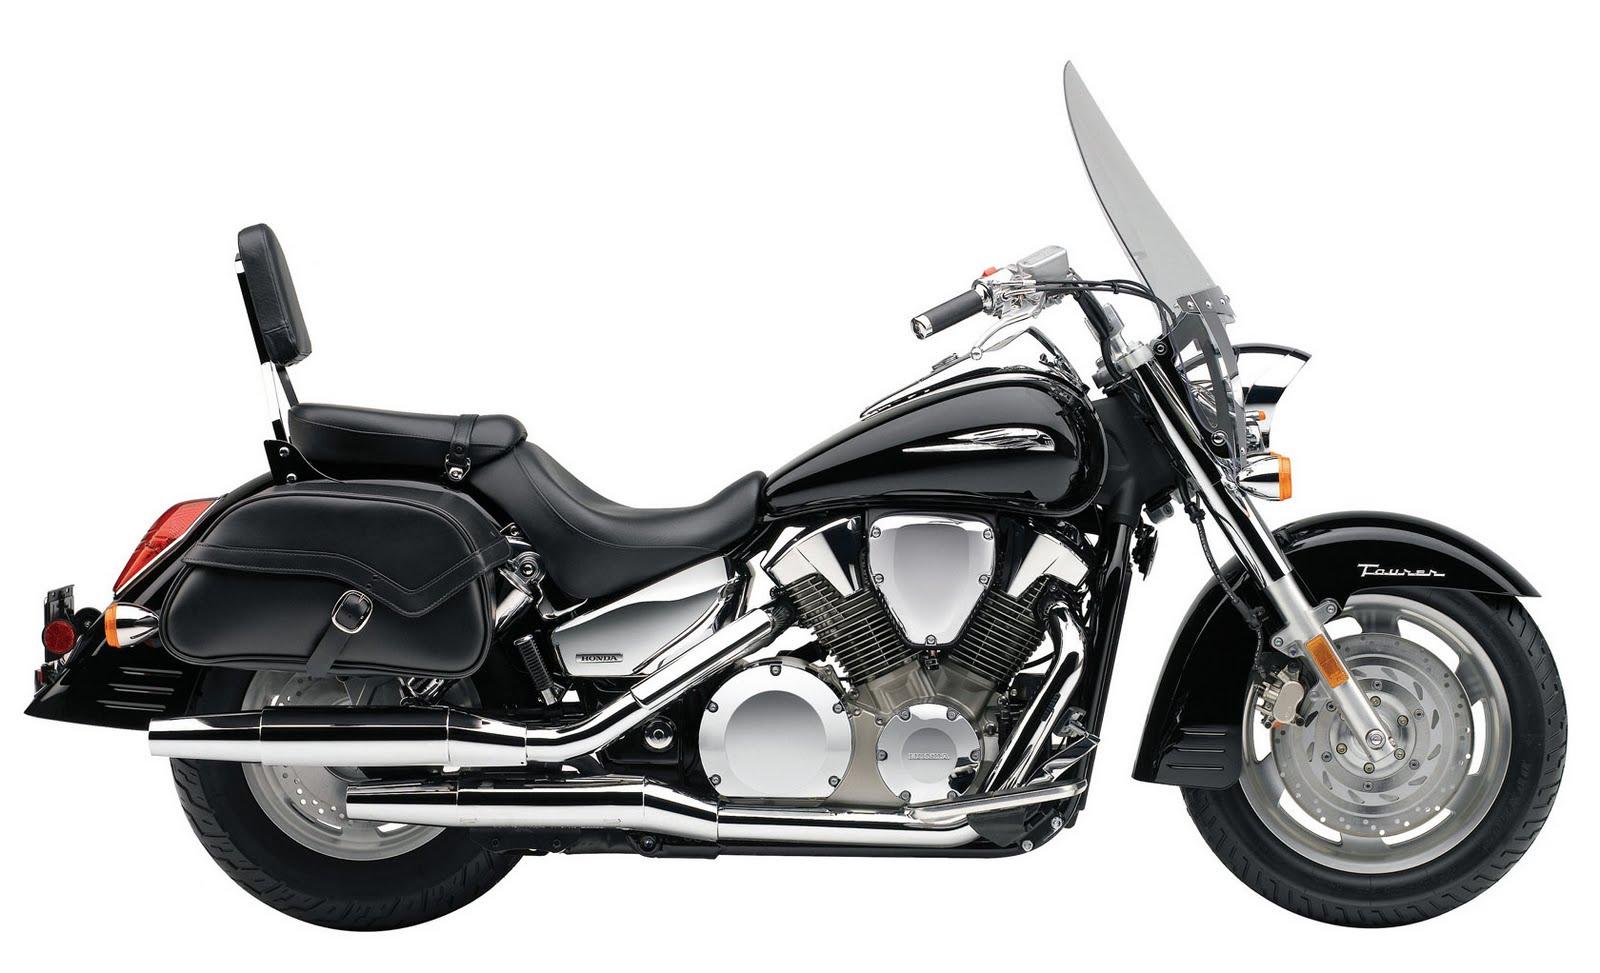 http://1.bp.blogspot.com/_ojOM-ul95fg/S871ls-ucAI/AAAAAAAAAig/jxF9FwkOsQ8/s1600/2009+Honda+VTX1300T+black.jpg